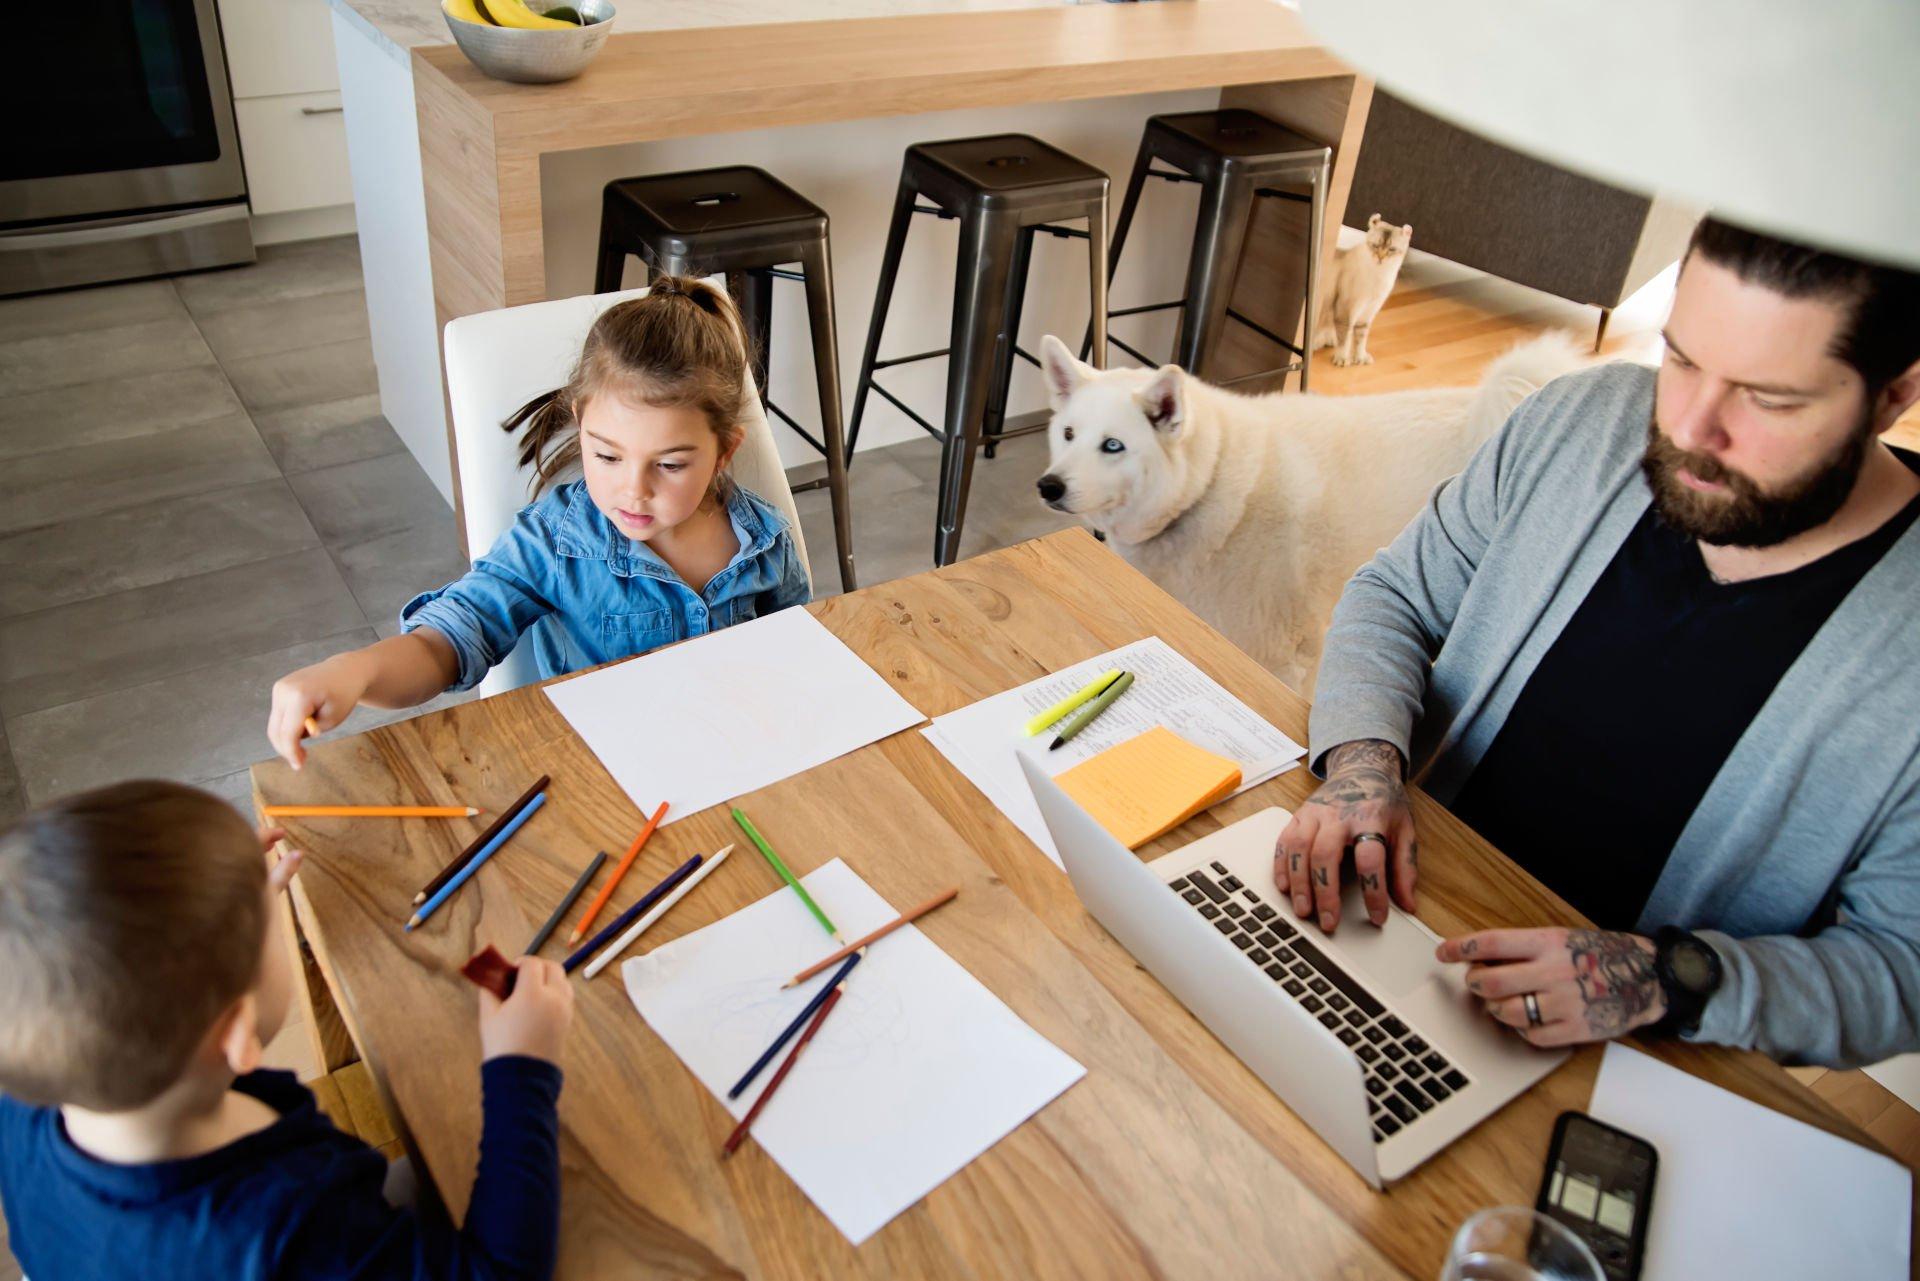 working-from-home-kids-man-dog-cat-kitchen